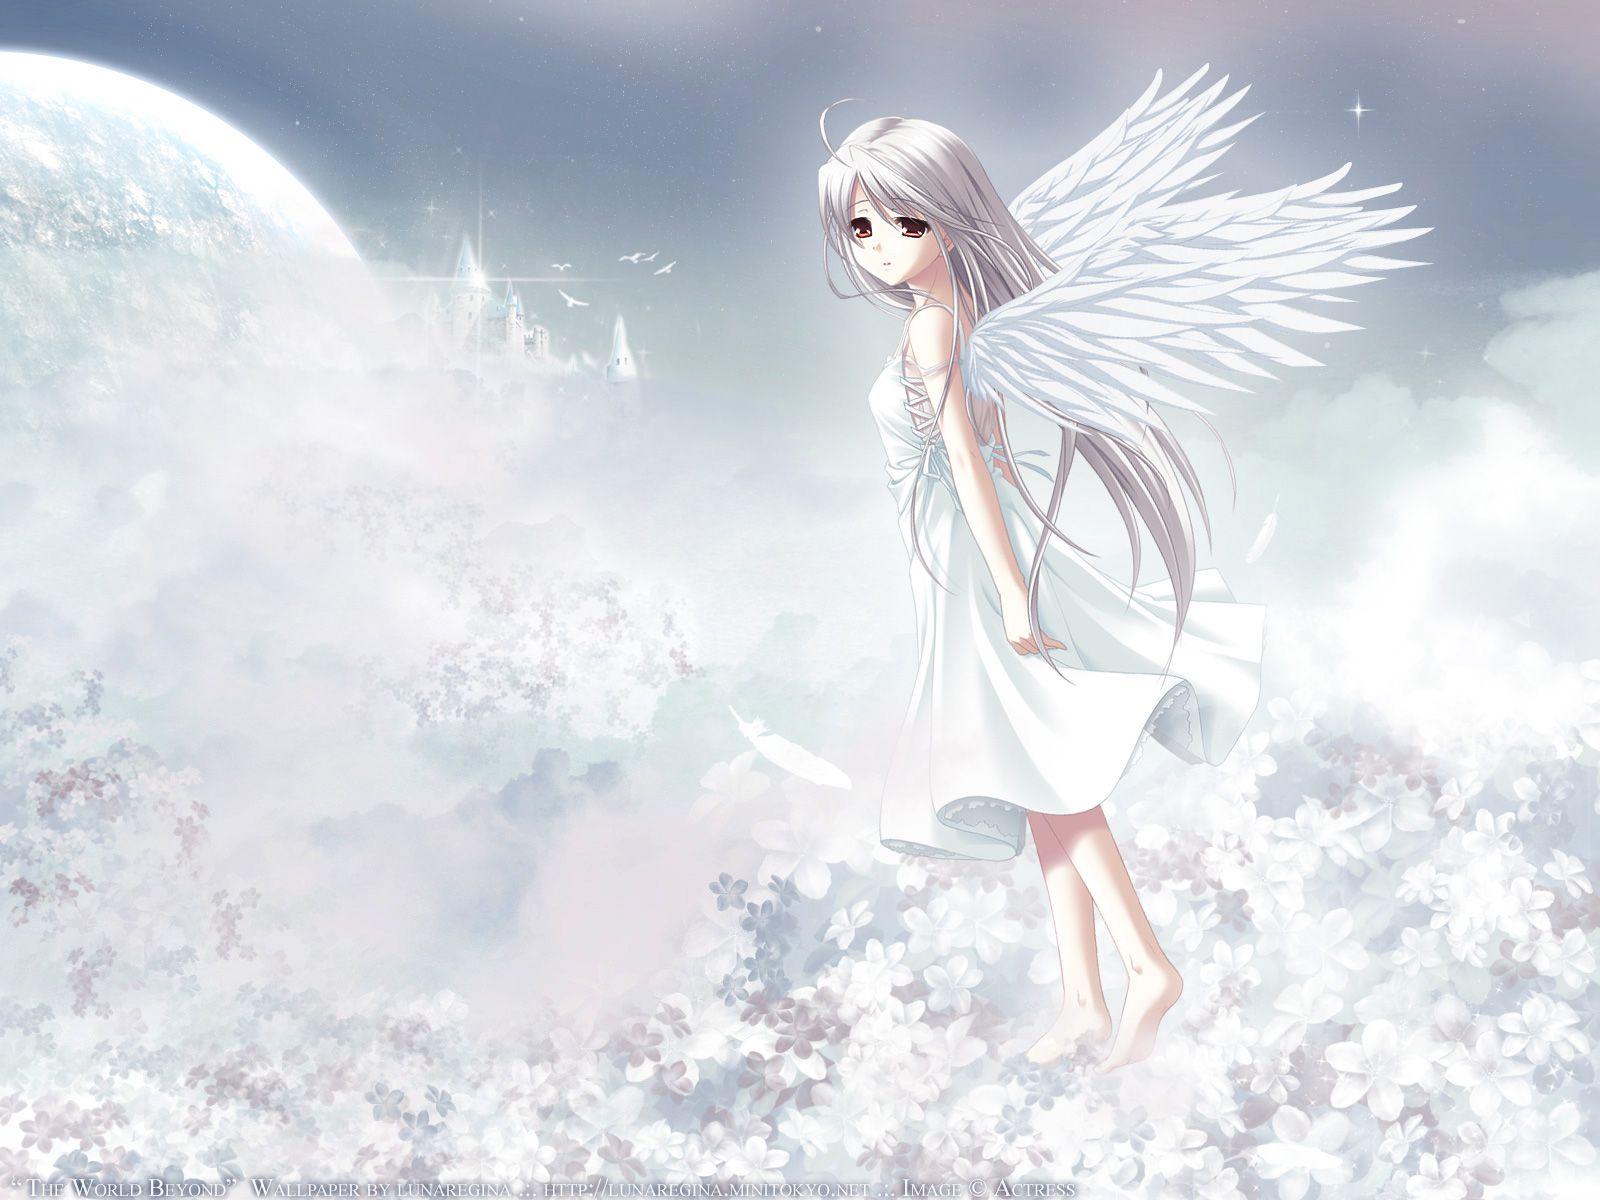 Angel Girl 15 Silveriness Image Anime Angel Angel Wallpaper Anime Angel Girl 15 wallpaper for anime